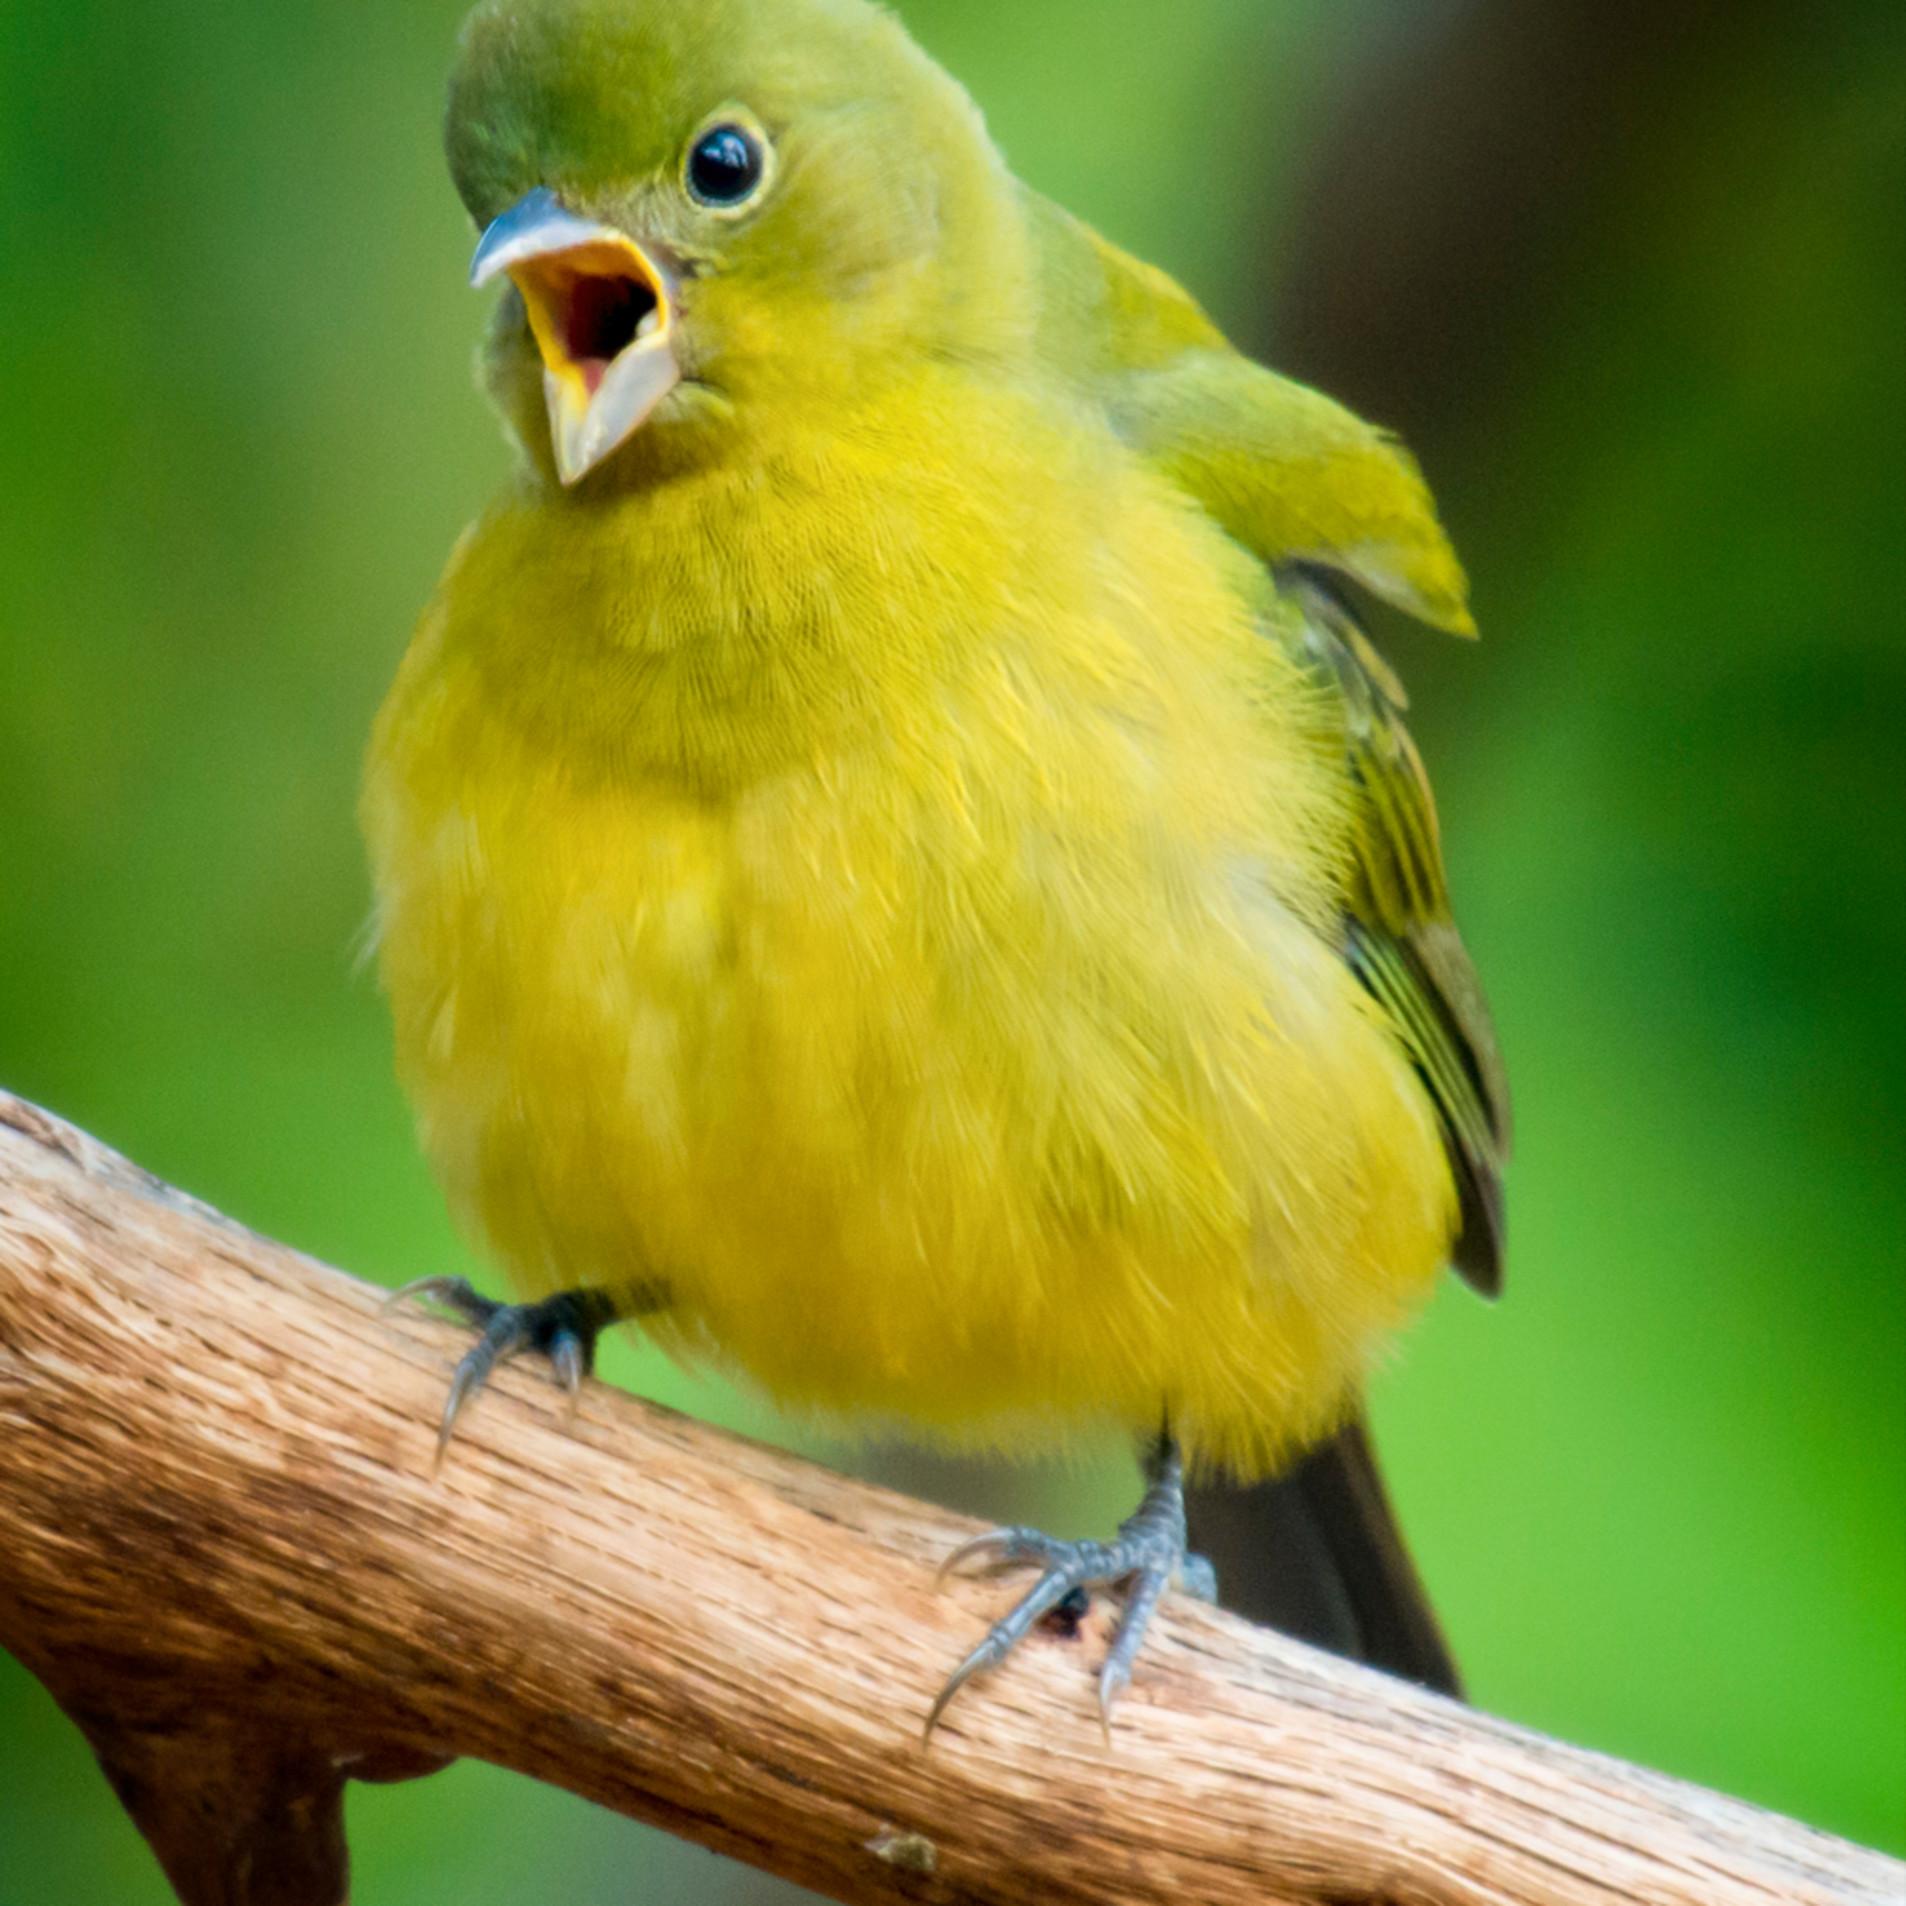 Backyard birds   sept 2019 20190927 4528 wwo1qx